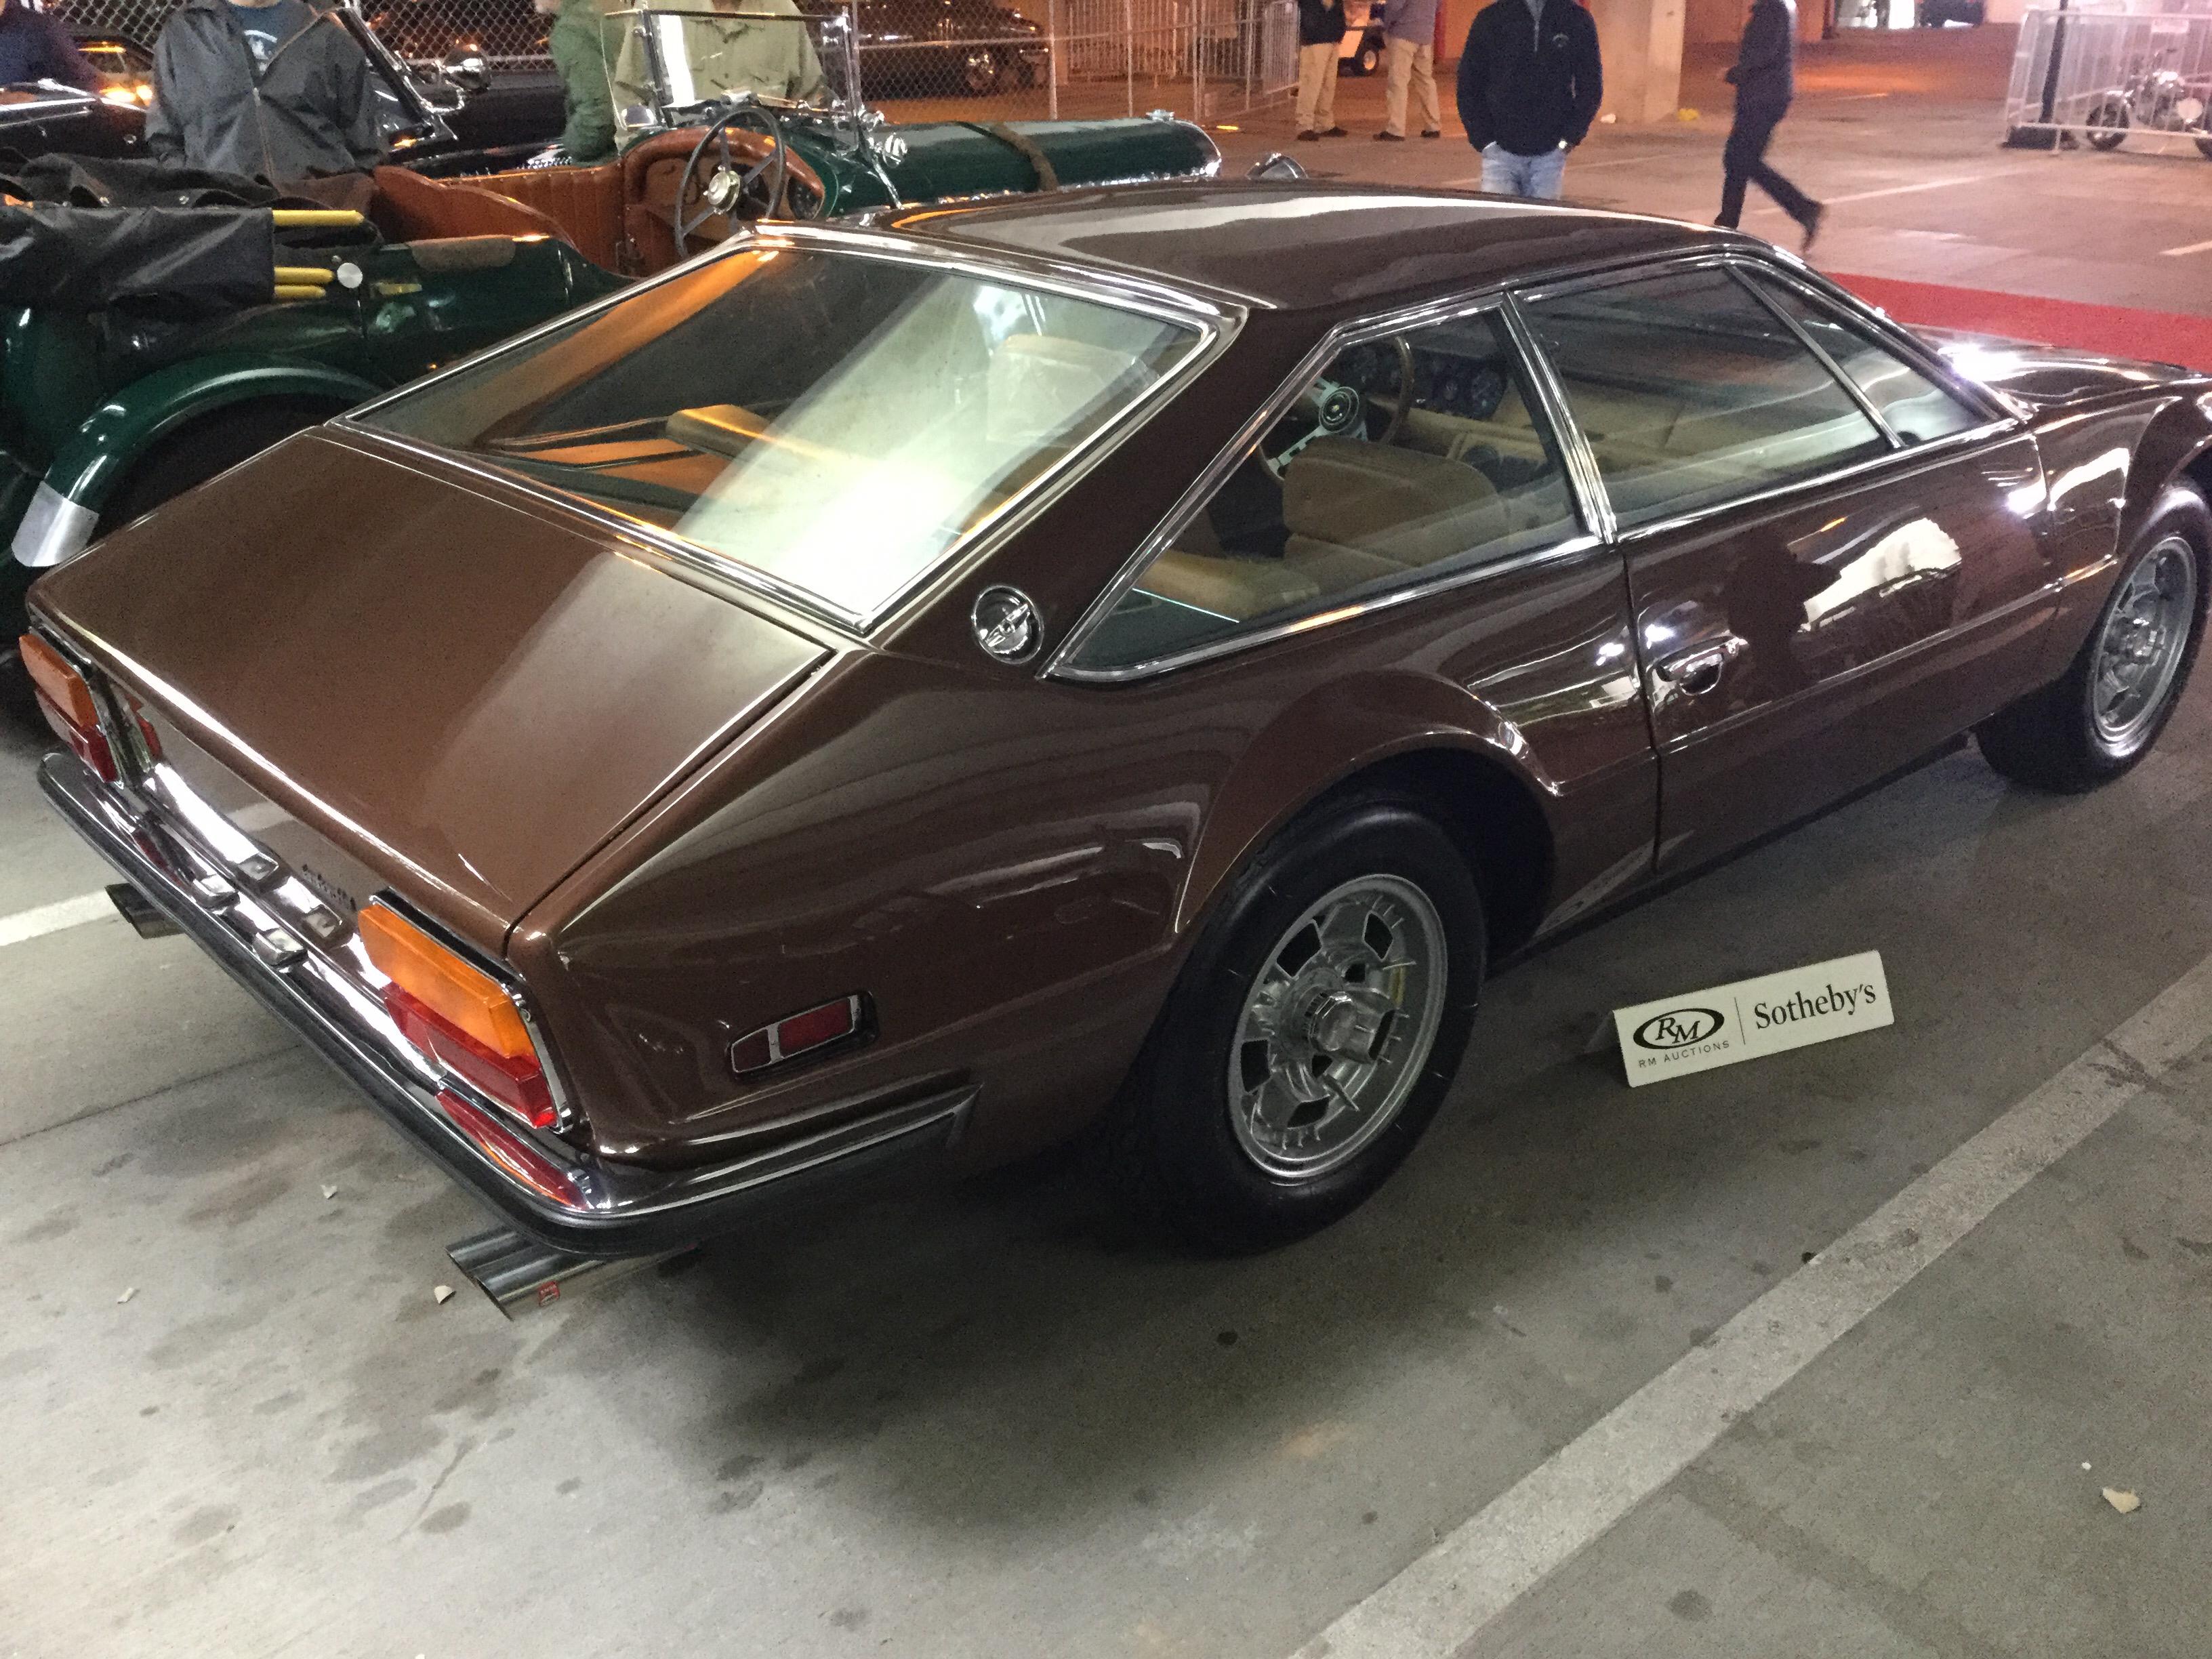 1970 Lamborghini Jarama 400 Gt Values Hagerty Valuation Tool